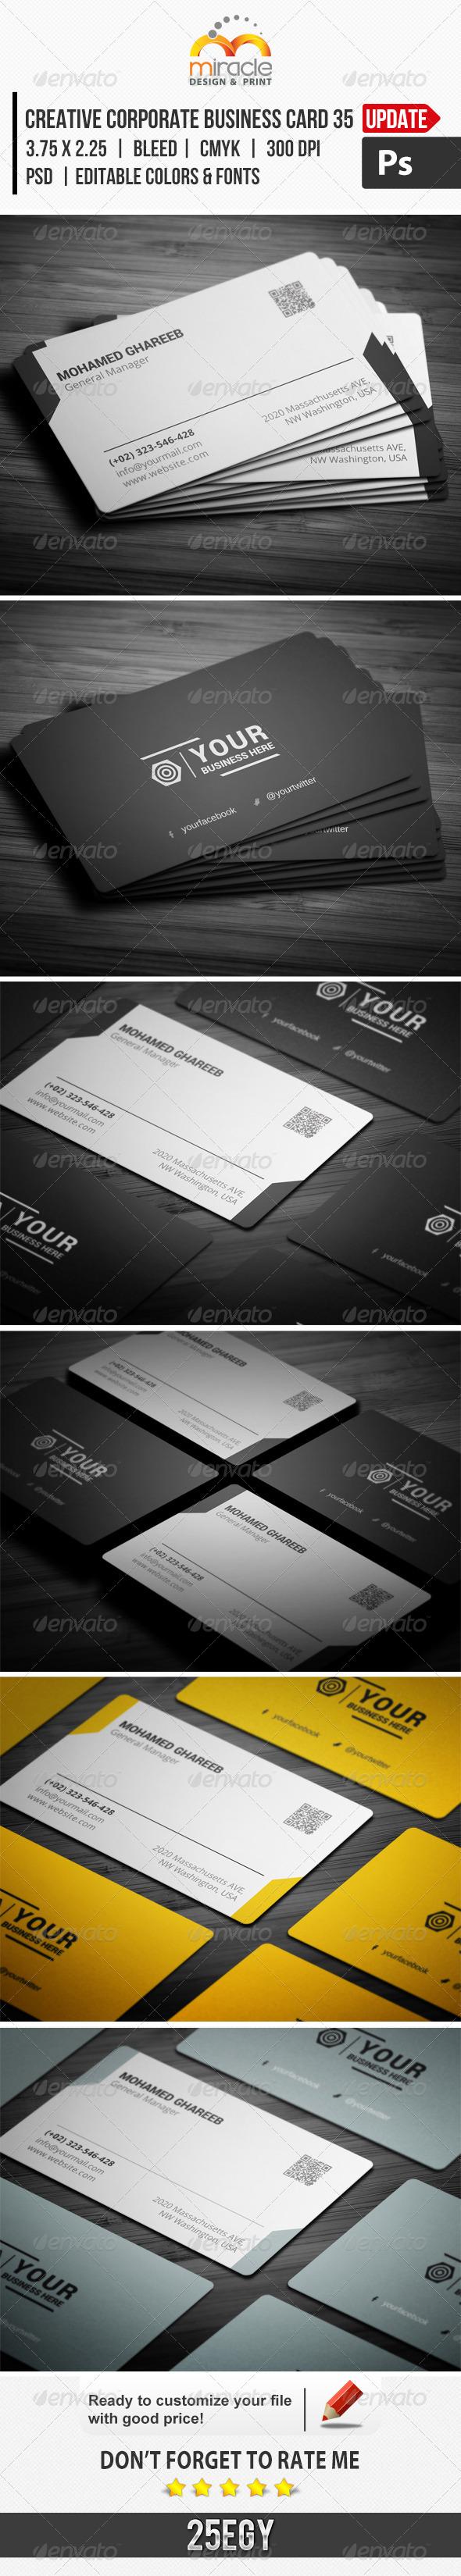 Creative Corporate Business Card 35 - Corporate Business Cards